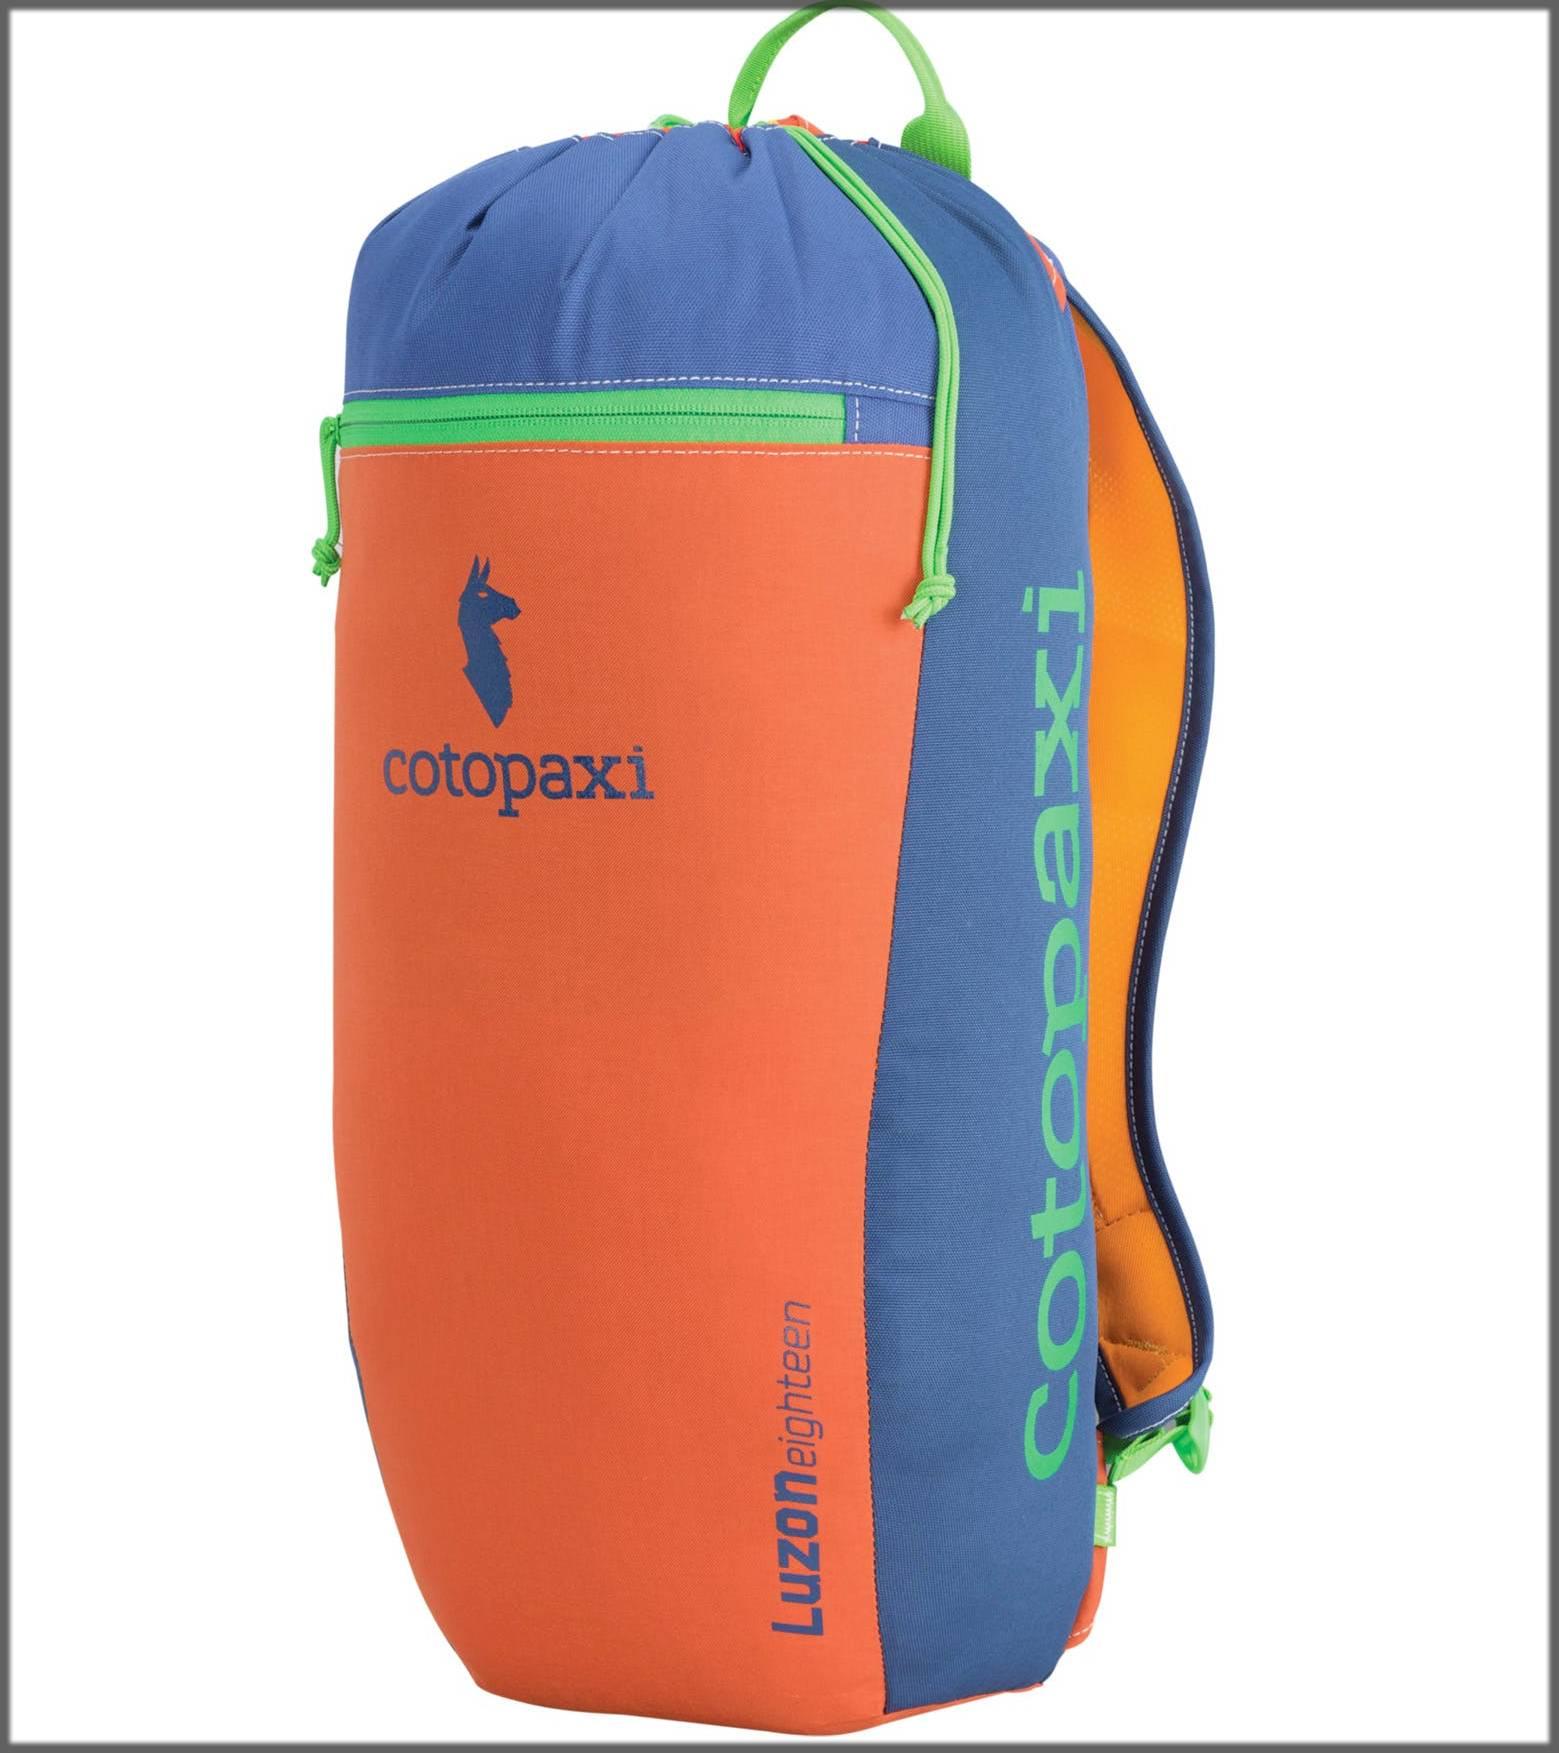 spacious hiking bag in orange